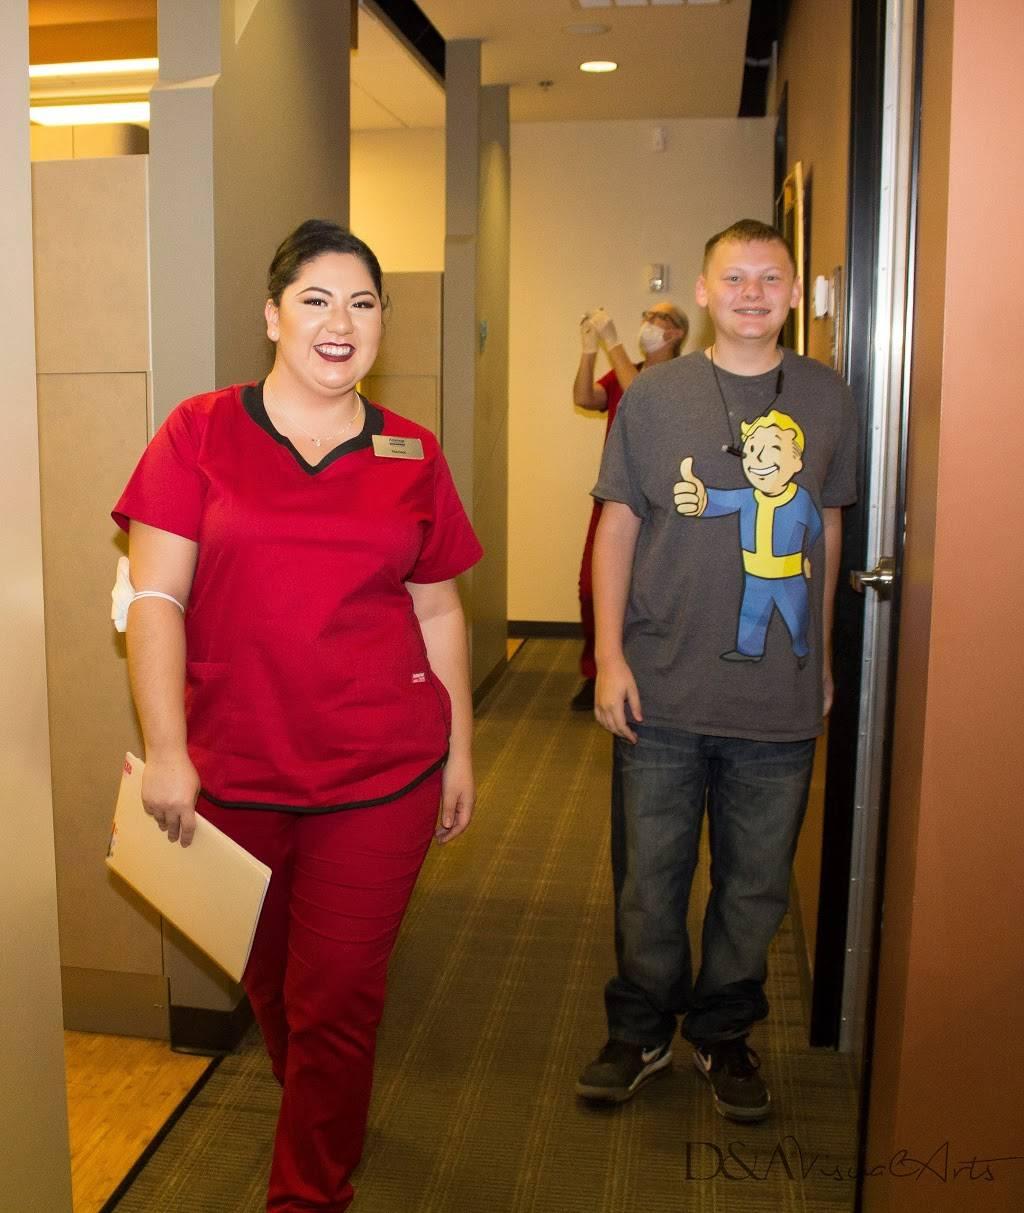 Arizona Orthodontic Centers - dentist    Photo 9 of 10   Address: 4130 N 108th Ave # 103, Phoenix, AZ 85037, USA   Phone: (623) 877-8500